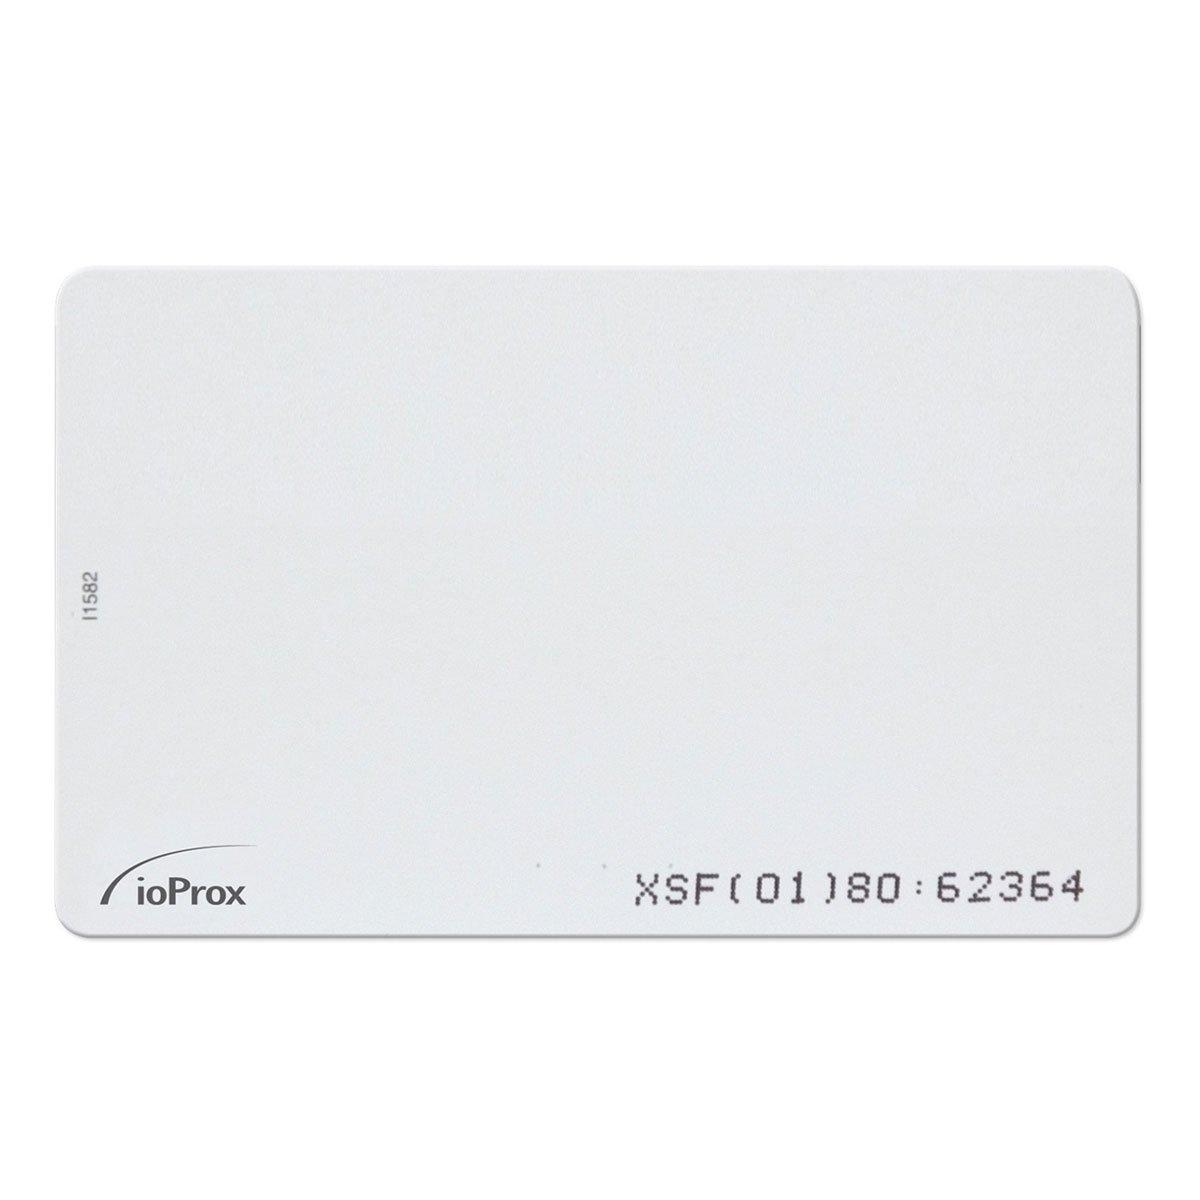 Kantech P20DYE ioProx Proximity Cards